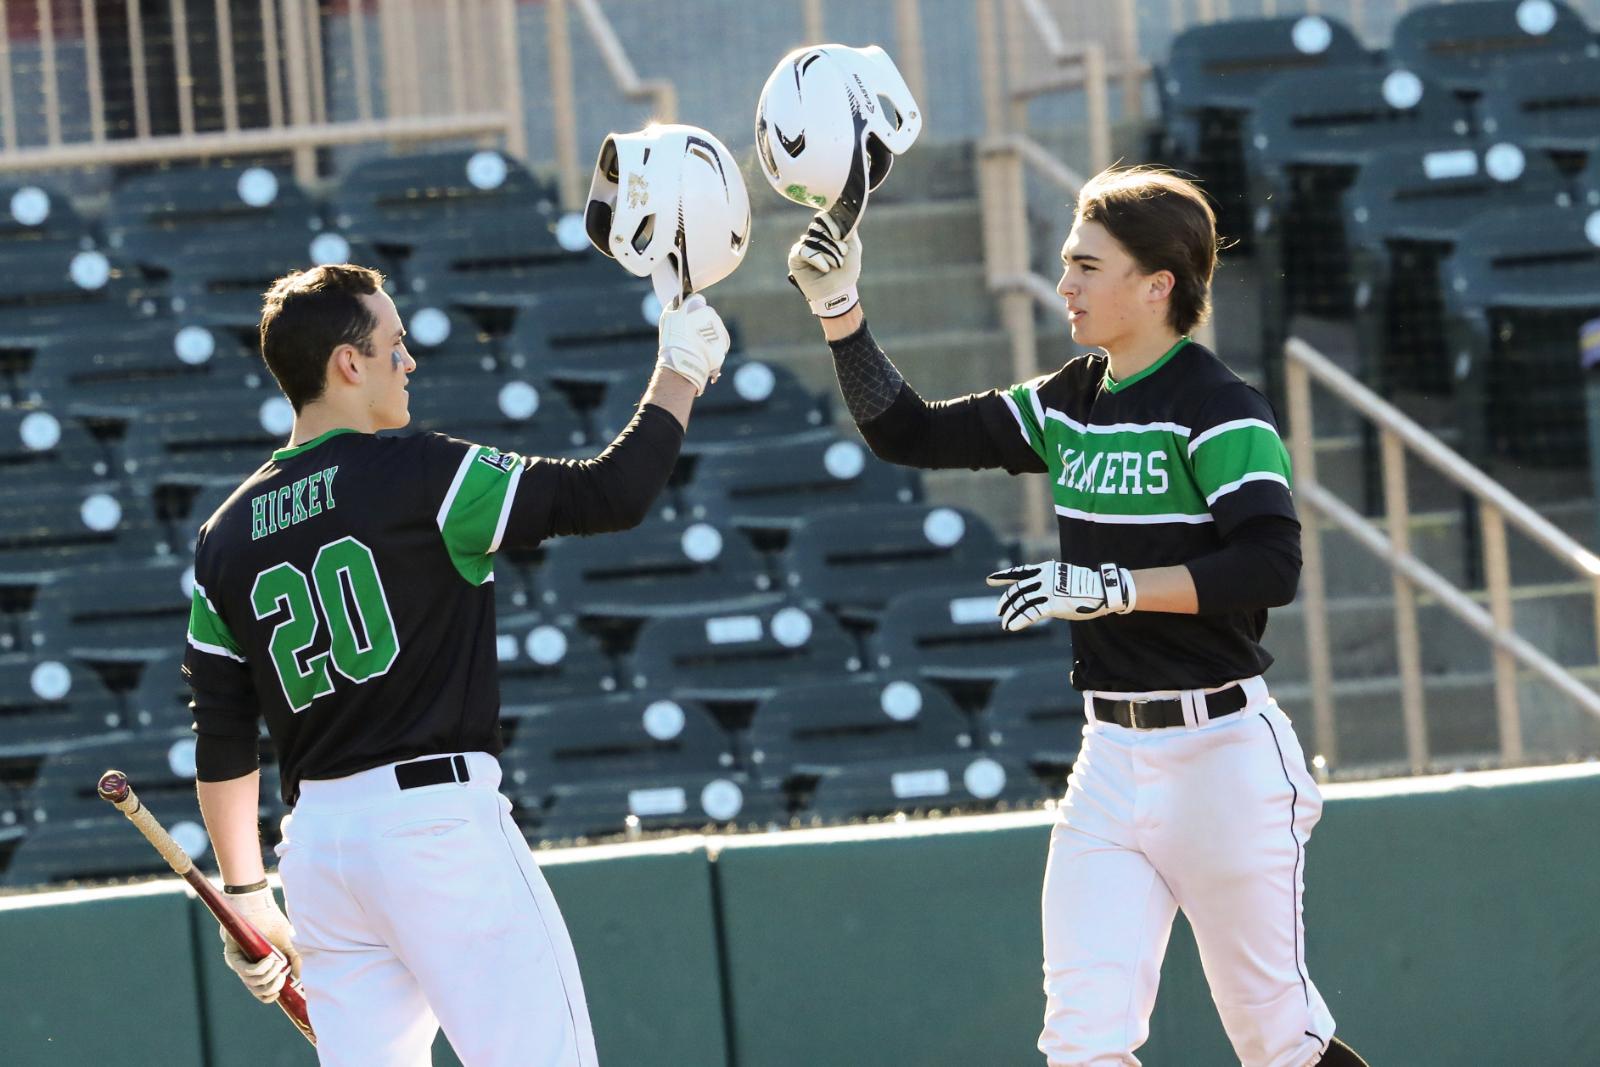 Baseball has 20 win season and receives top honors!